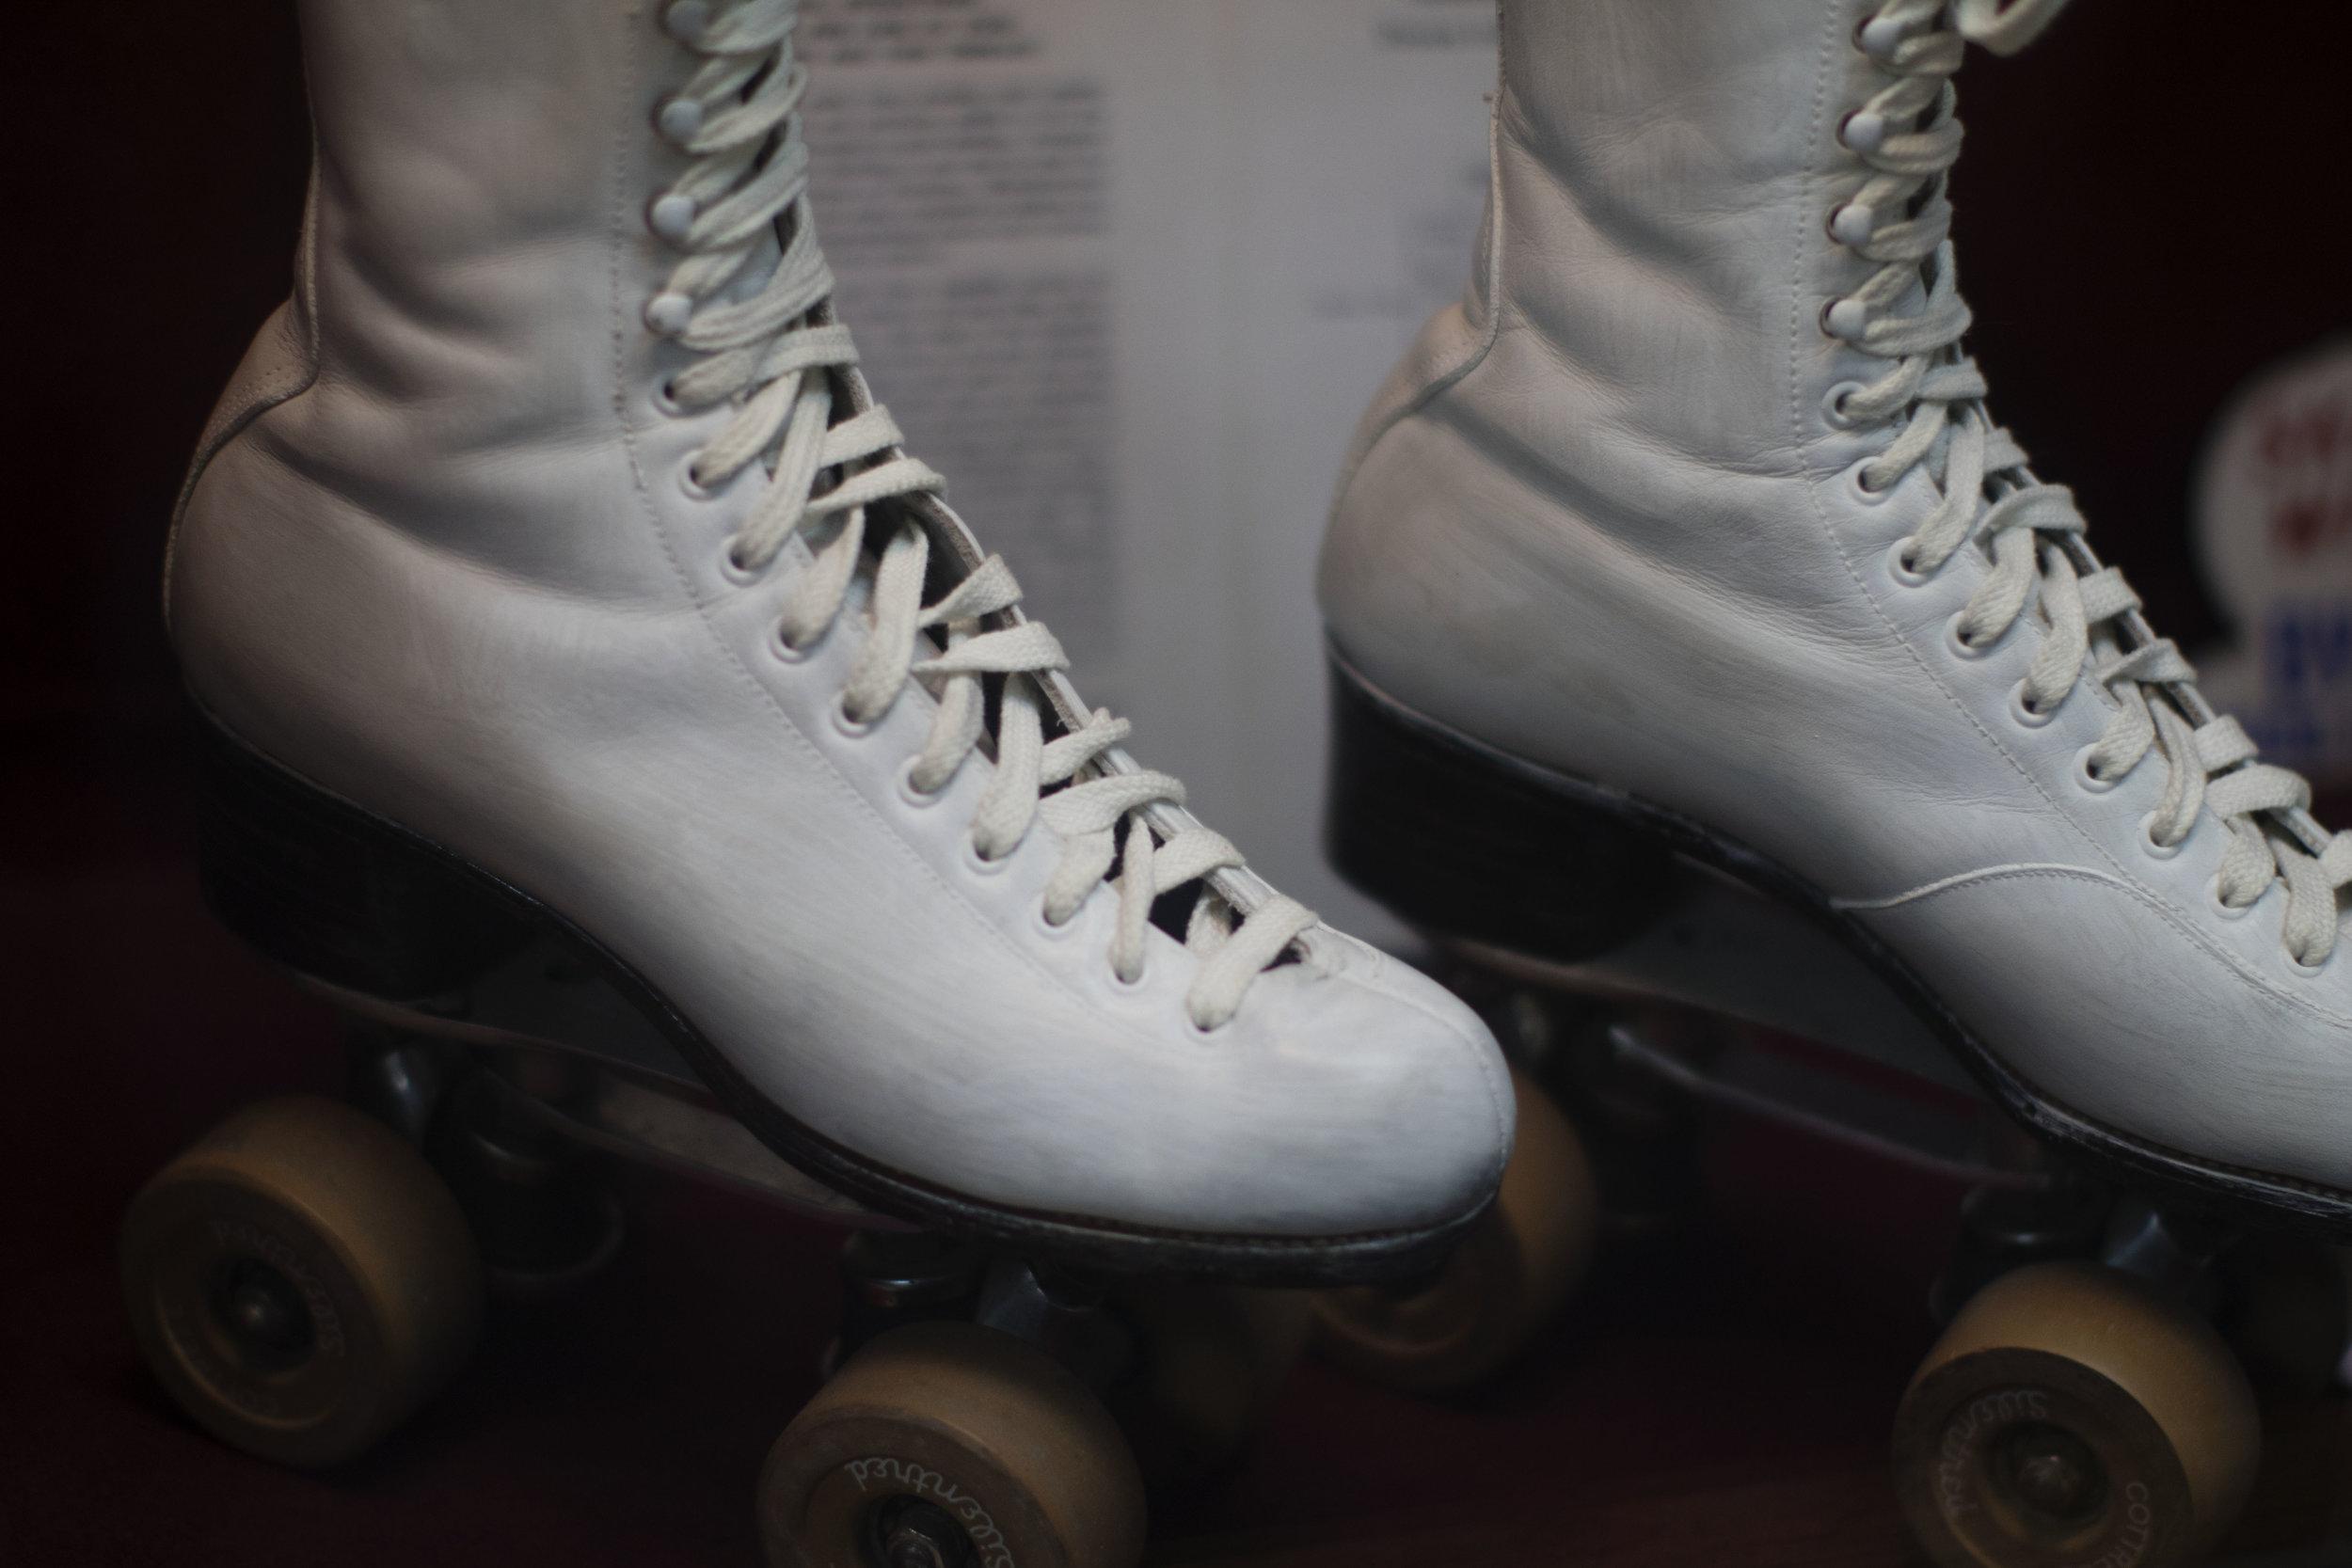 Roller Skating - falling in style ... horizontally | PC: Kayla Potts